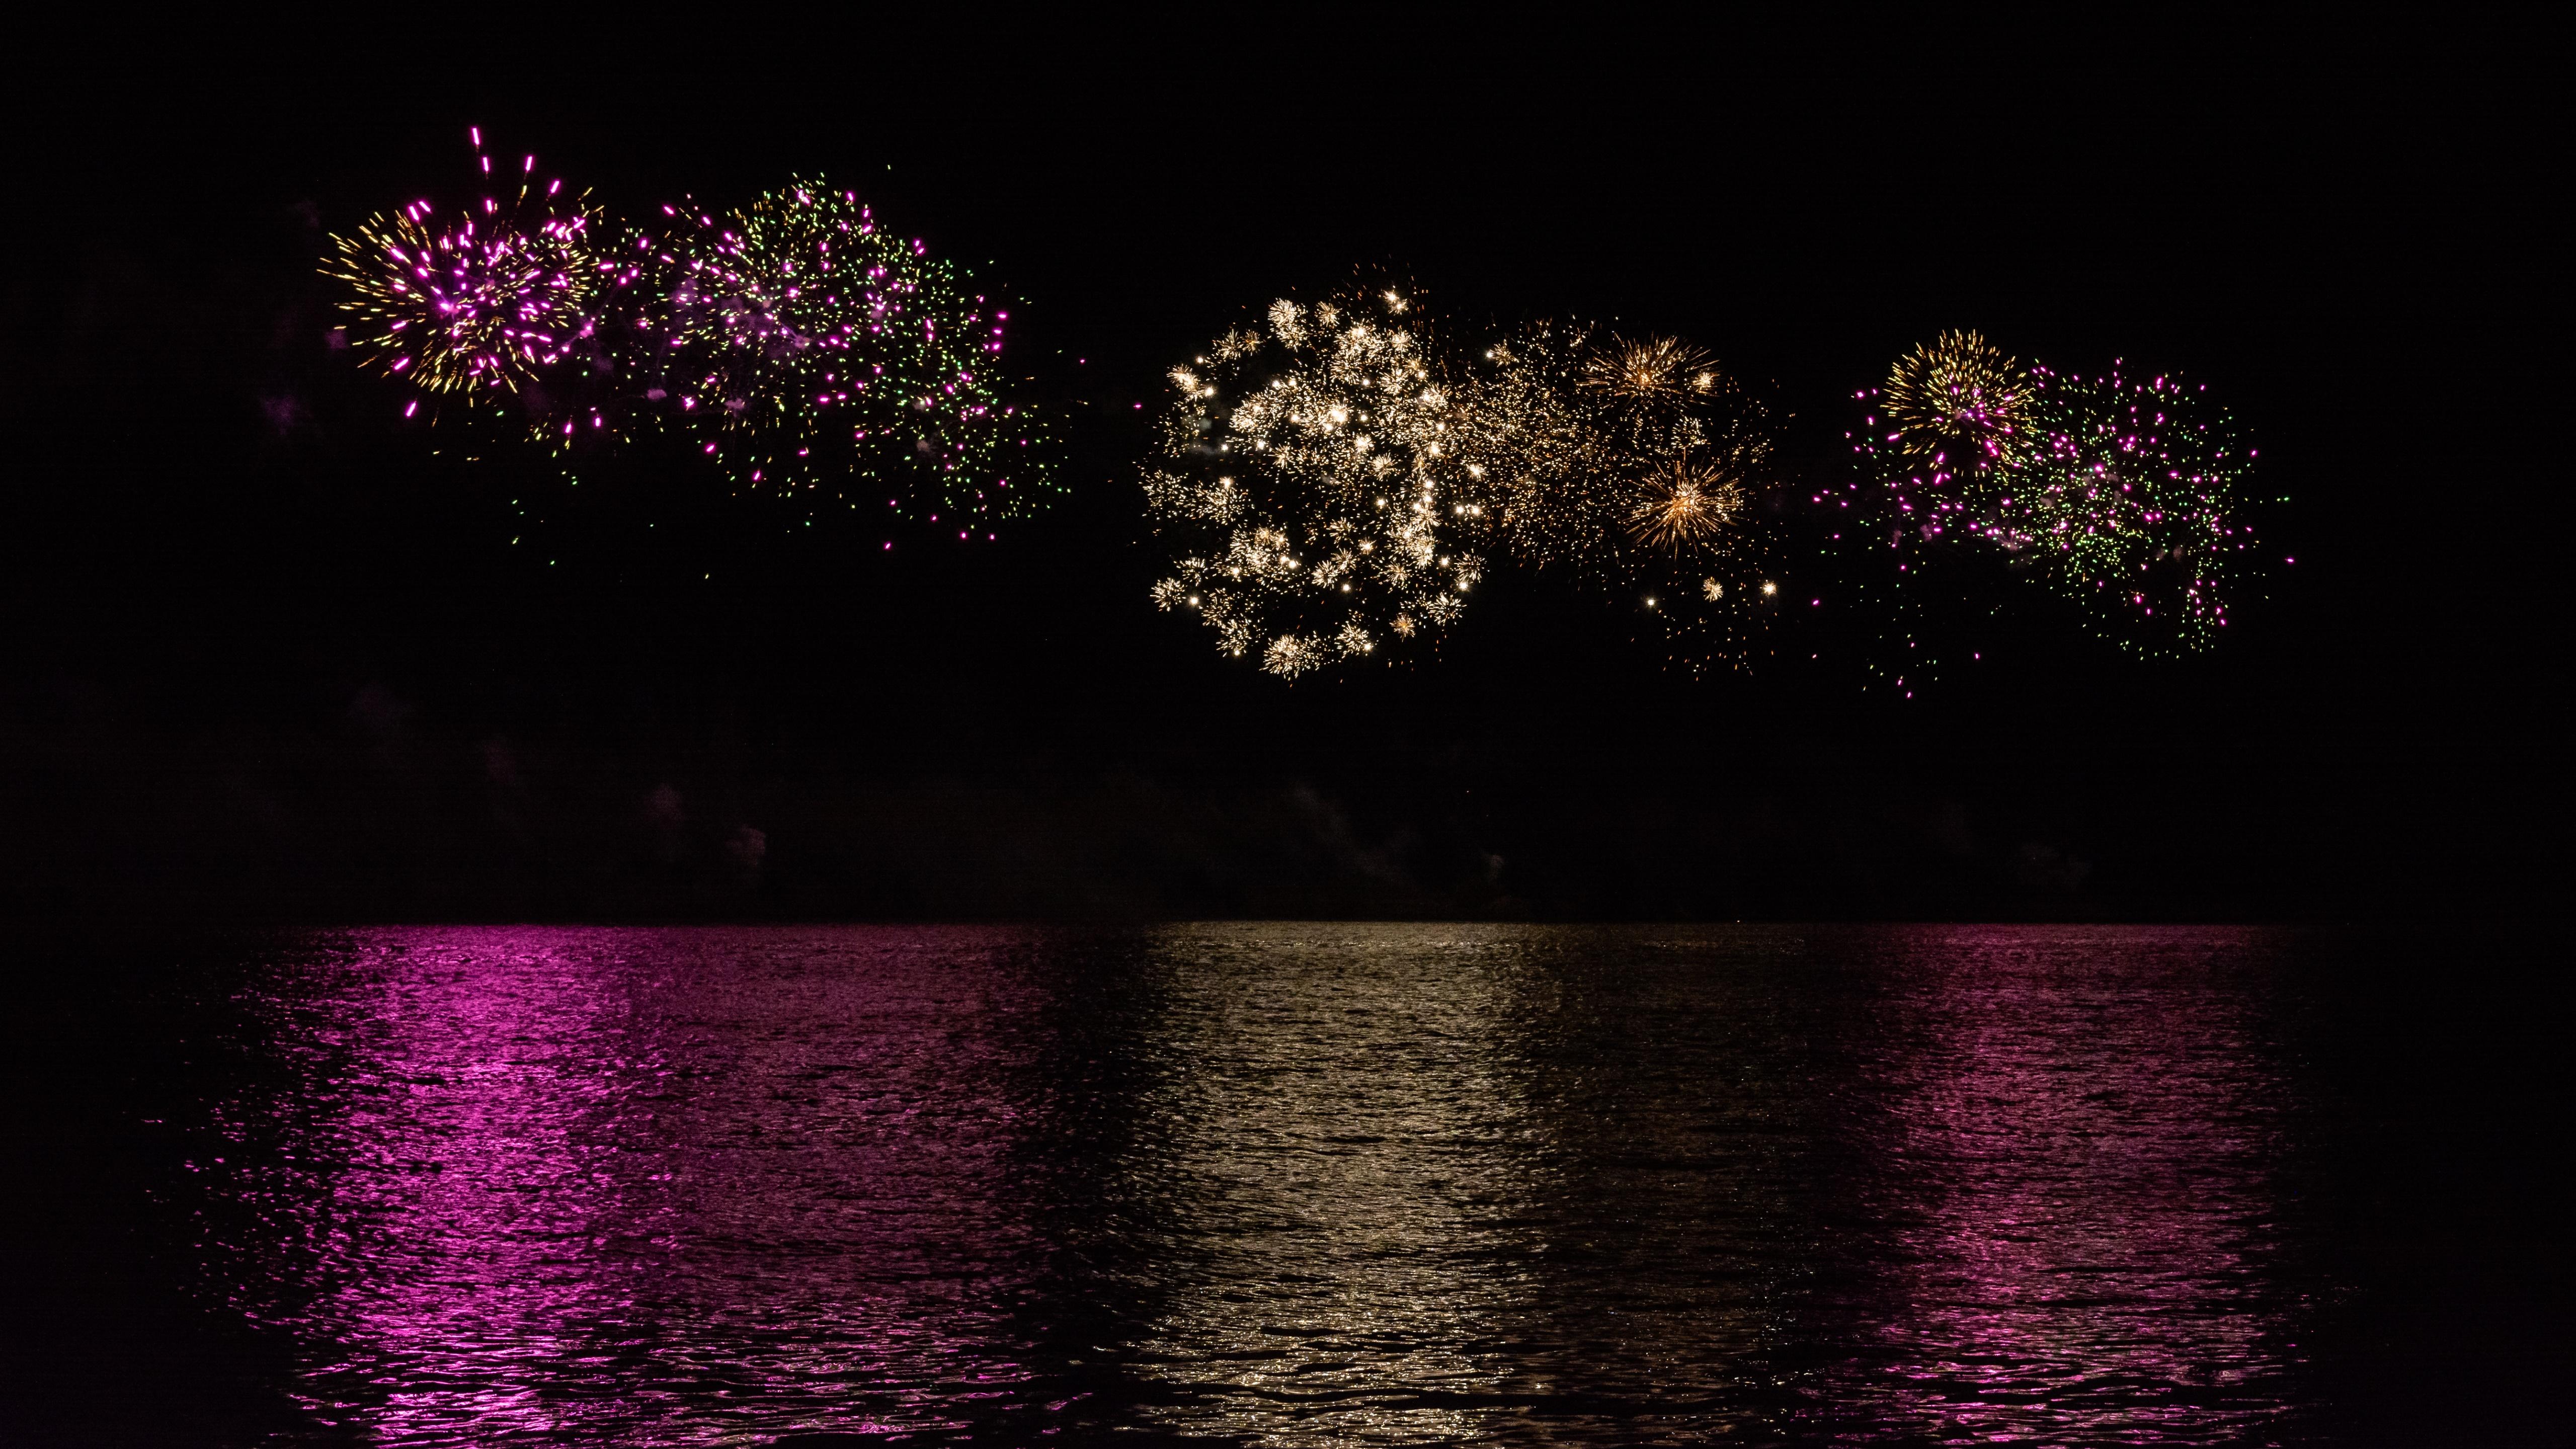 Fireworks at the International Horticultural Fair in Tulln wallpaper